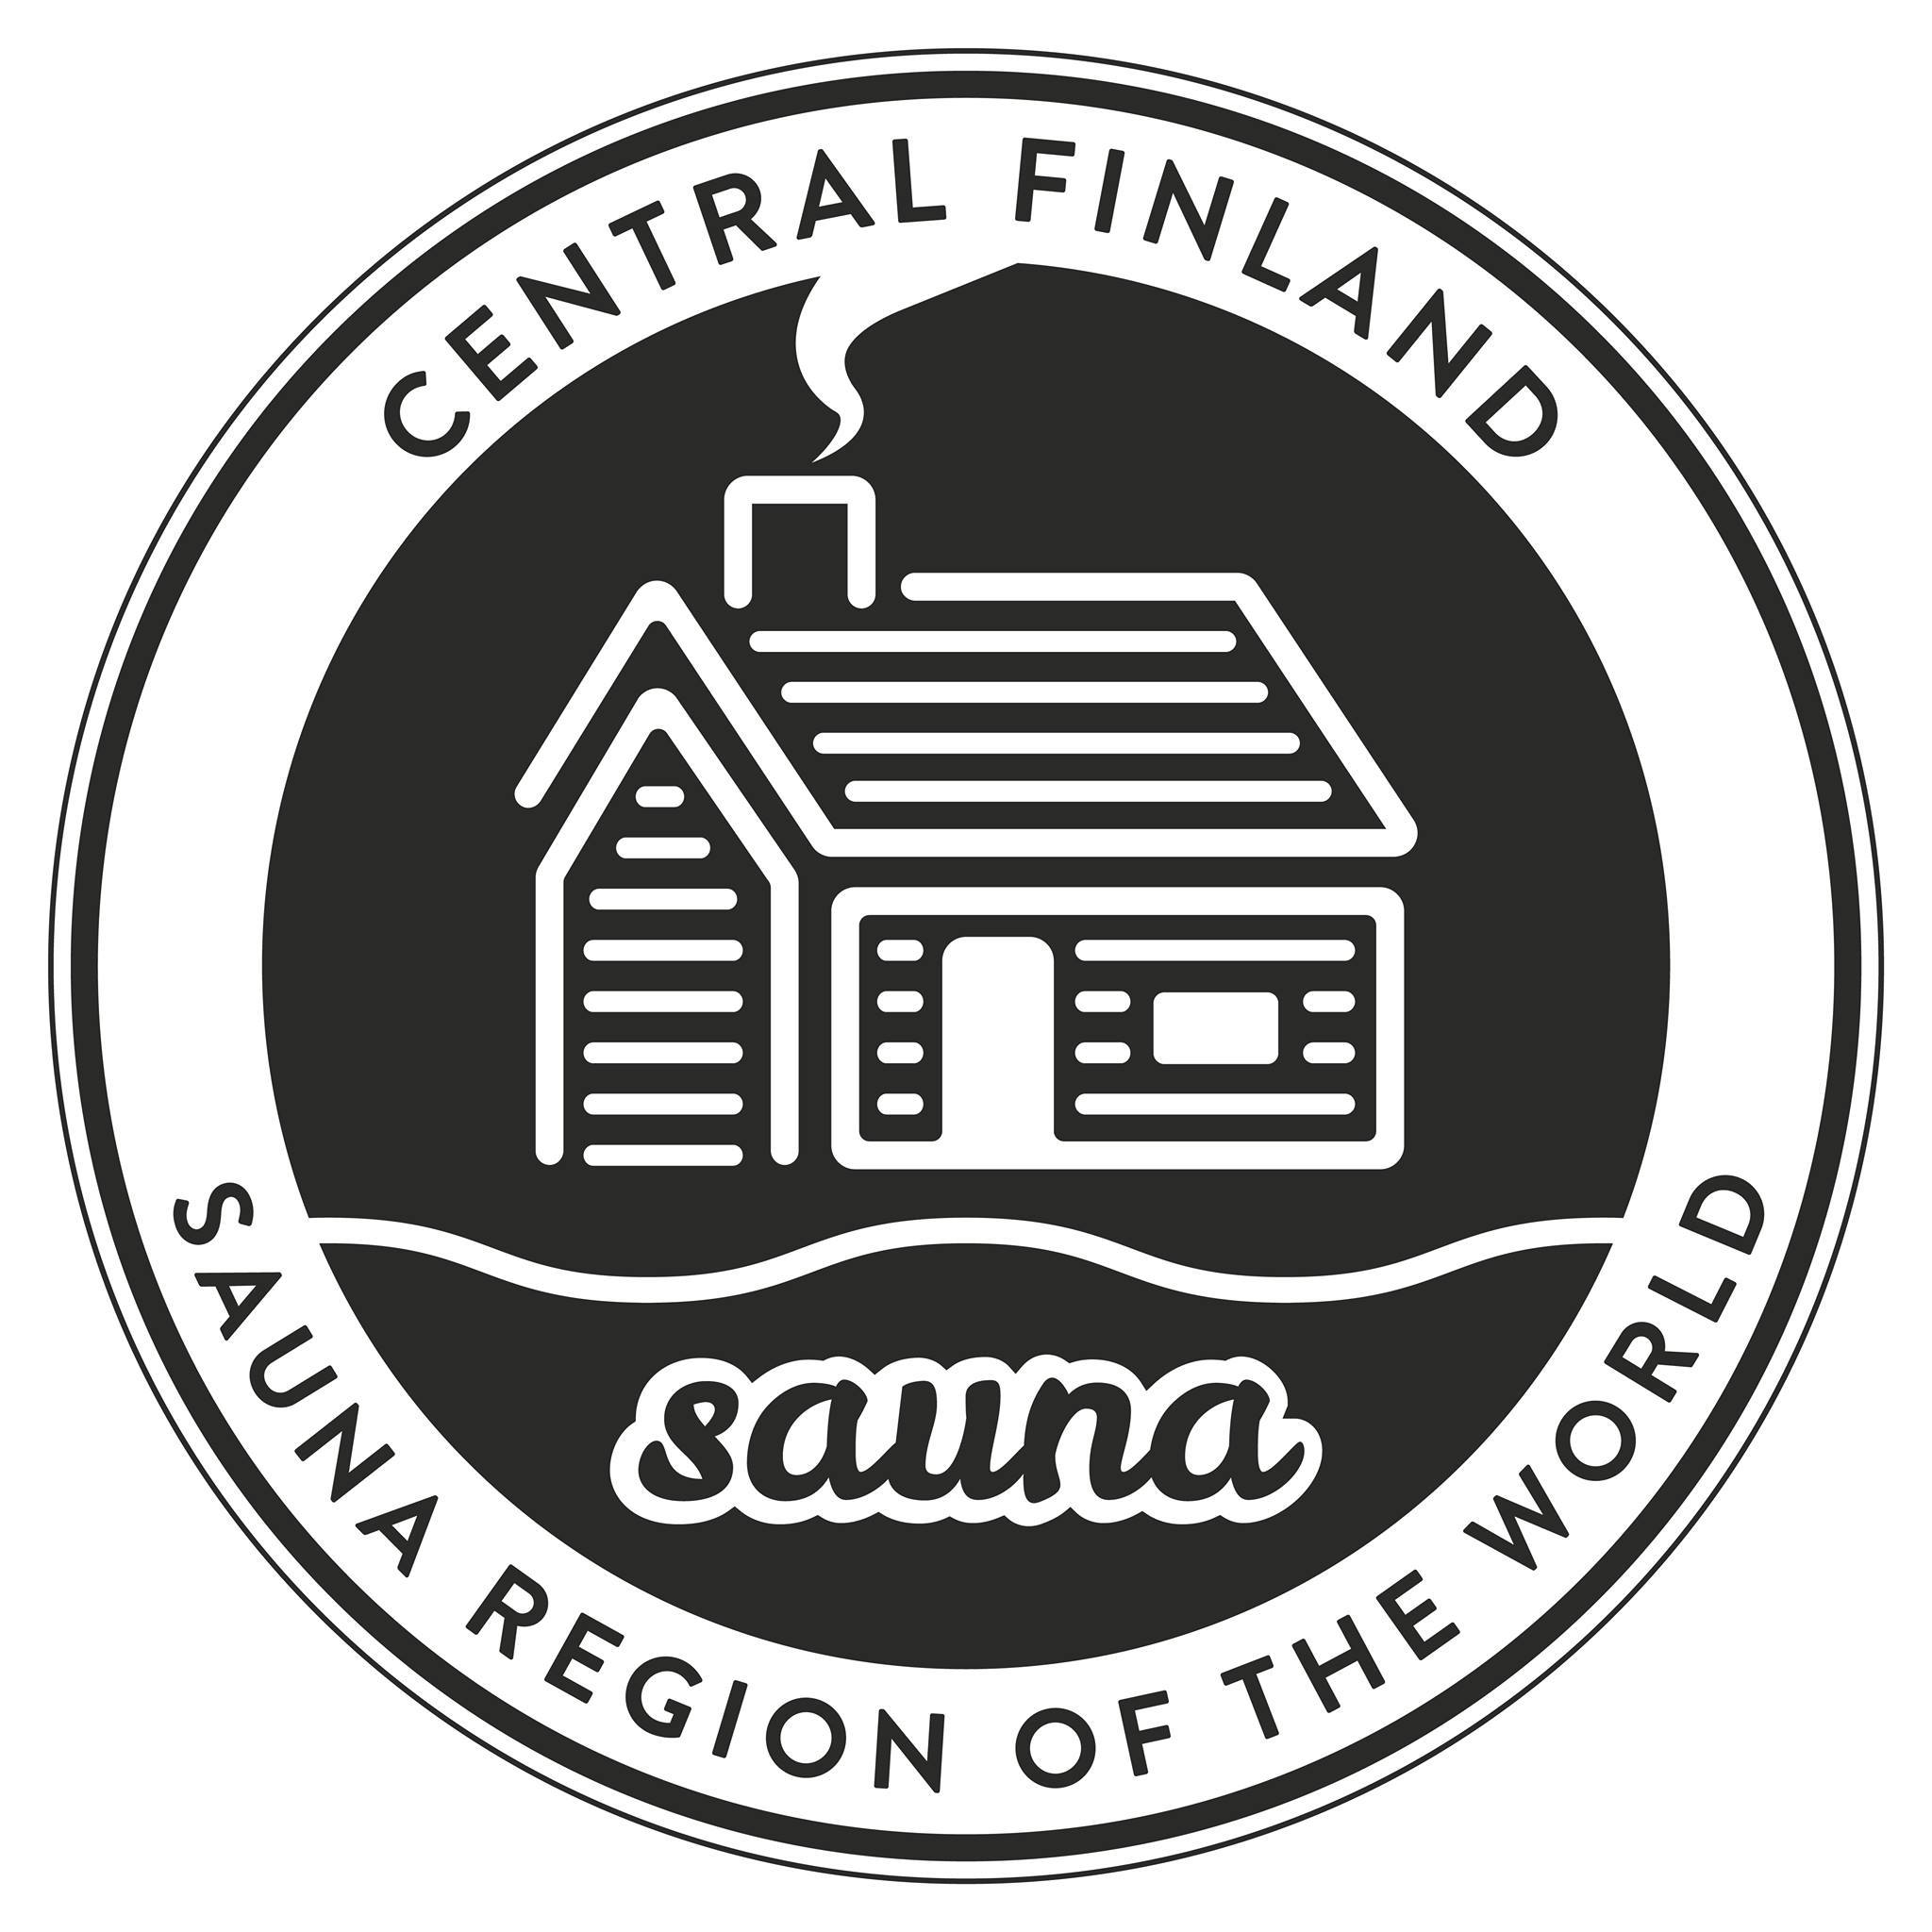 visit-central-finland-logo.jpg